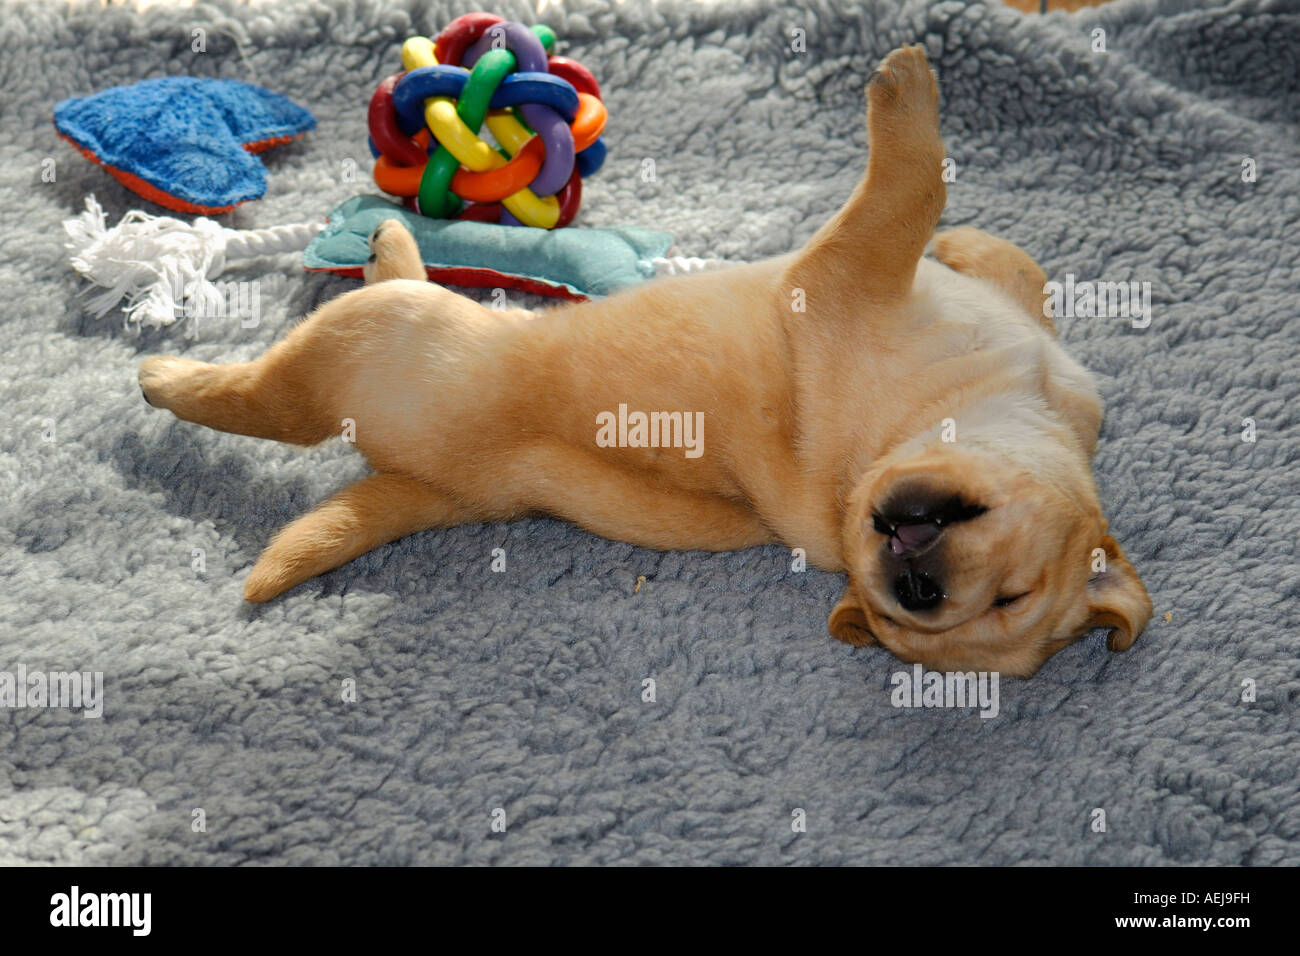 Sleeping puppy, yellow Labrador Retriever - Stock Image